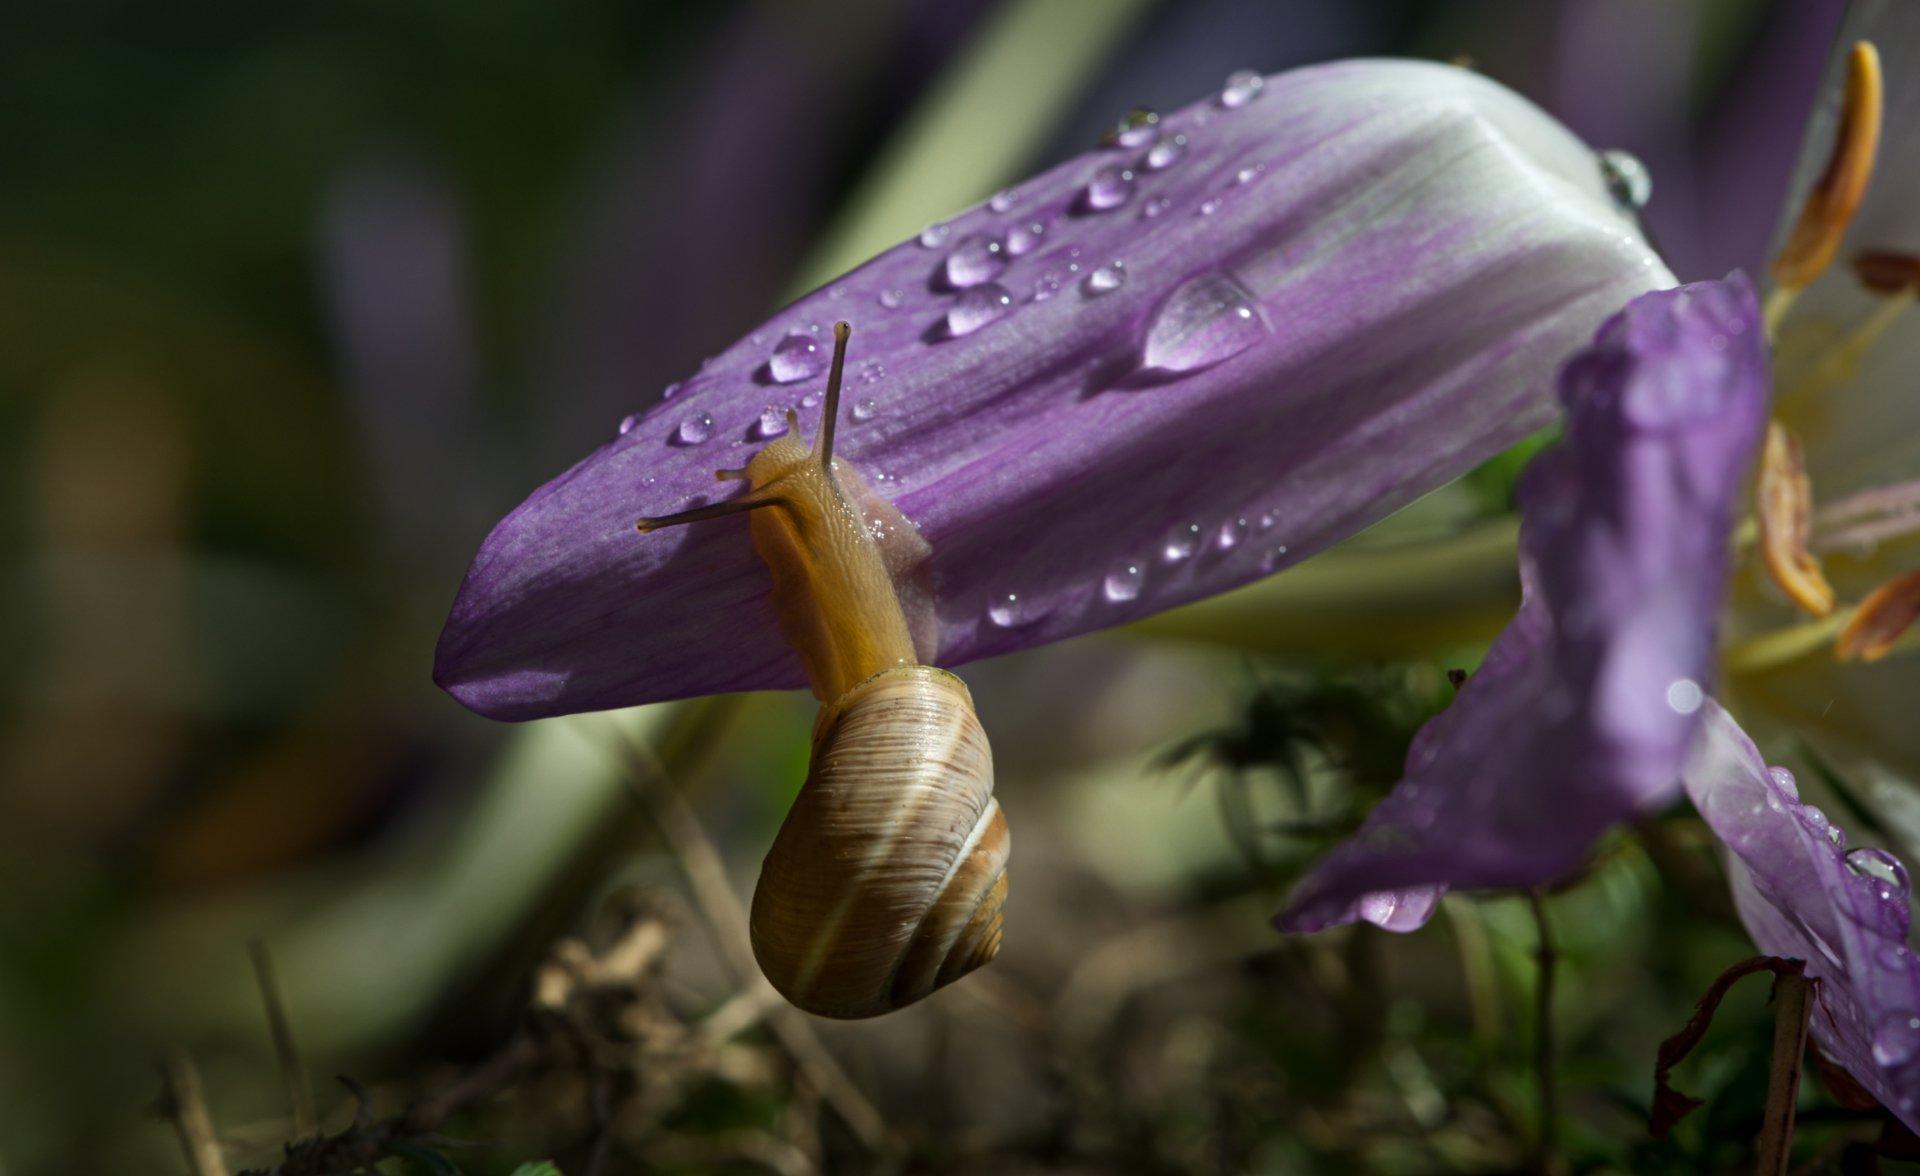 природа, макро, цветок, безвременник, улитка, капли дождя, Неля Рачкова